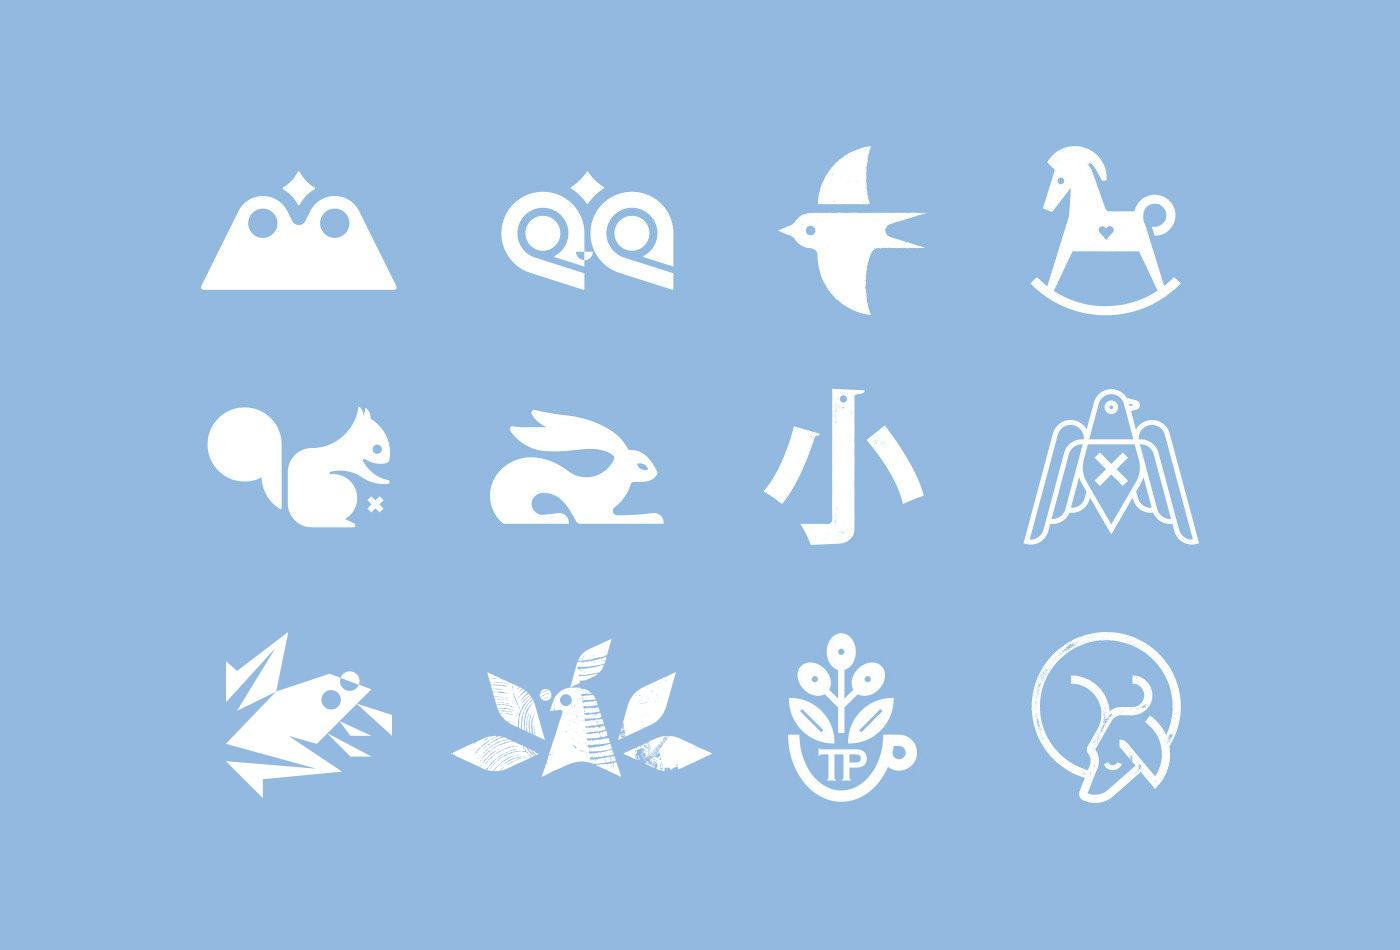 C-logo-symbol-logos-pictogram-marks-trademarks-trademark-glyph-icon-icons-logotype-collection-vacaliebres-birds